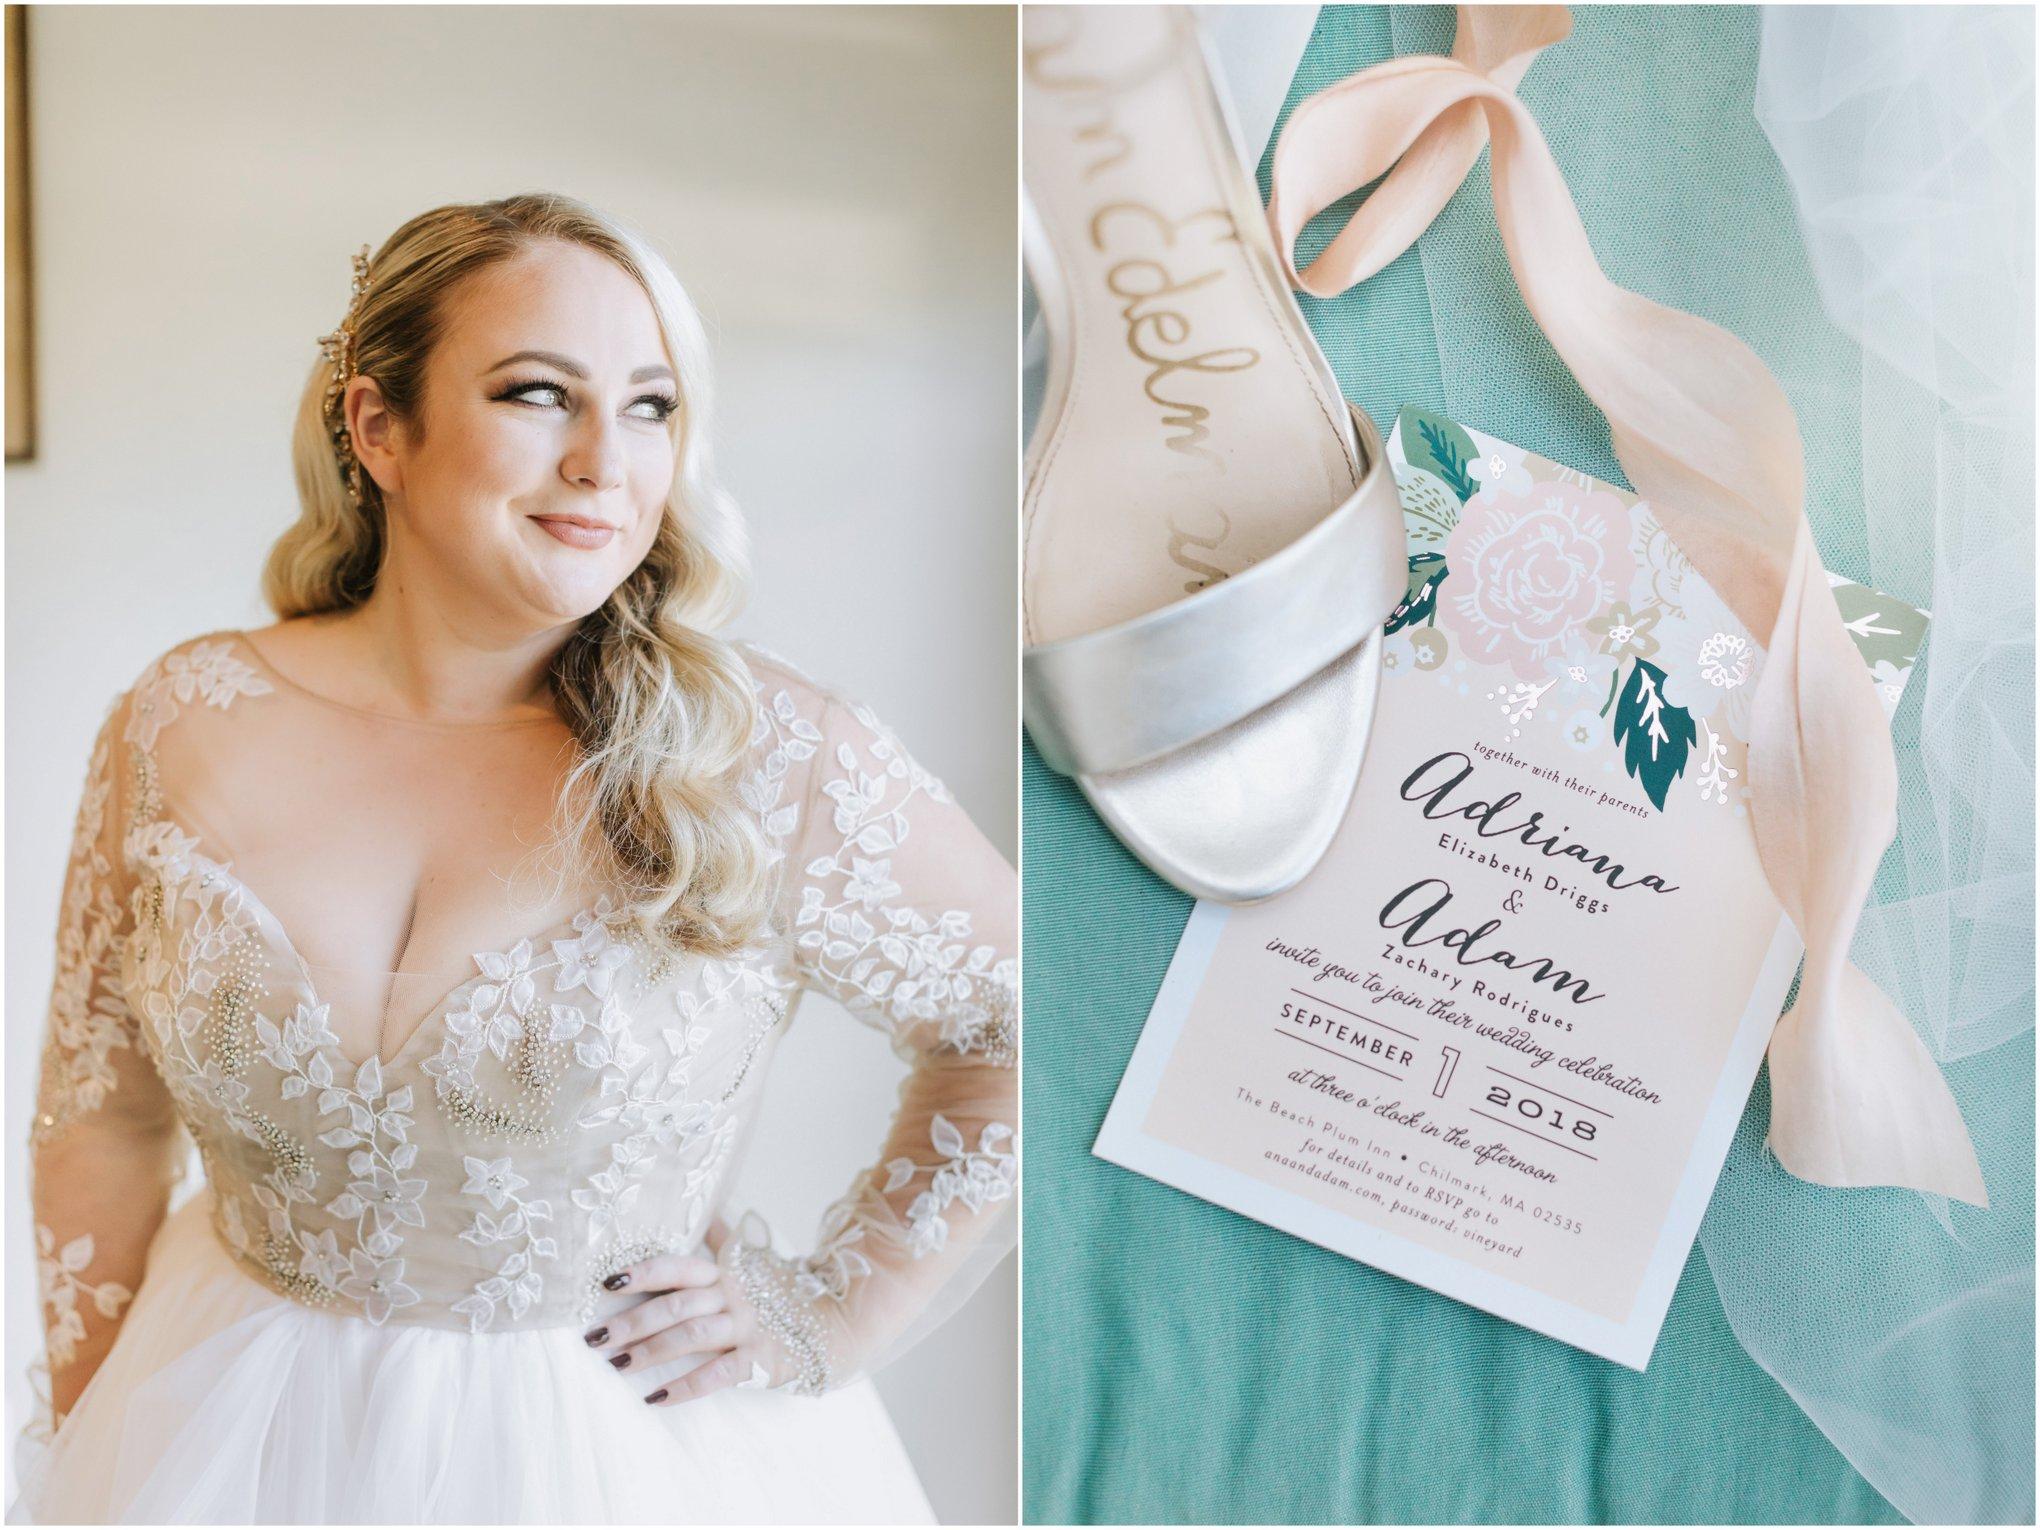 Marthas-Vineyard-Wedding-Photographer-Beach-Plum-Inn-9.jpg